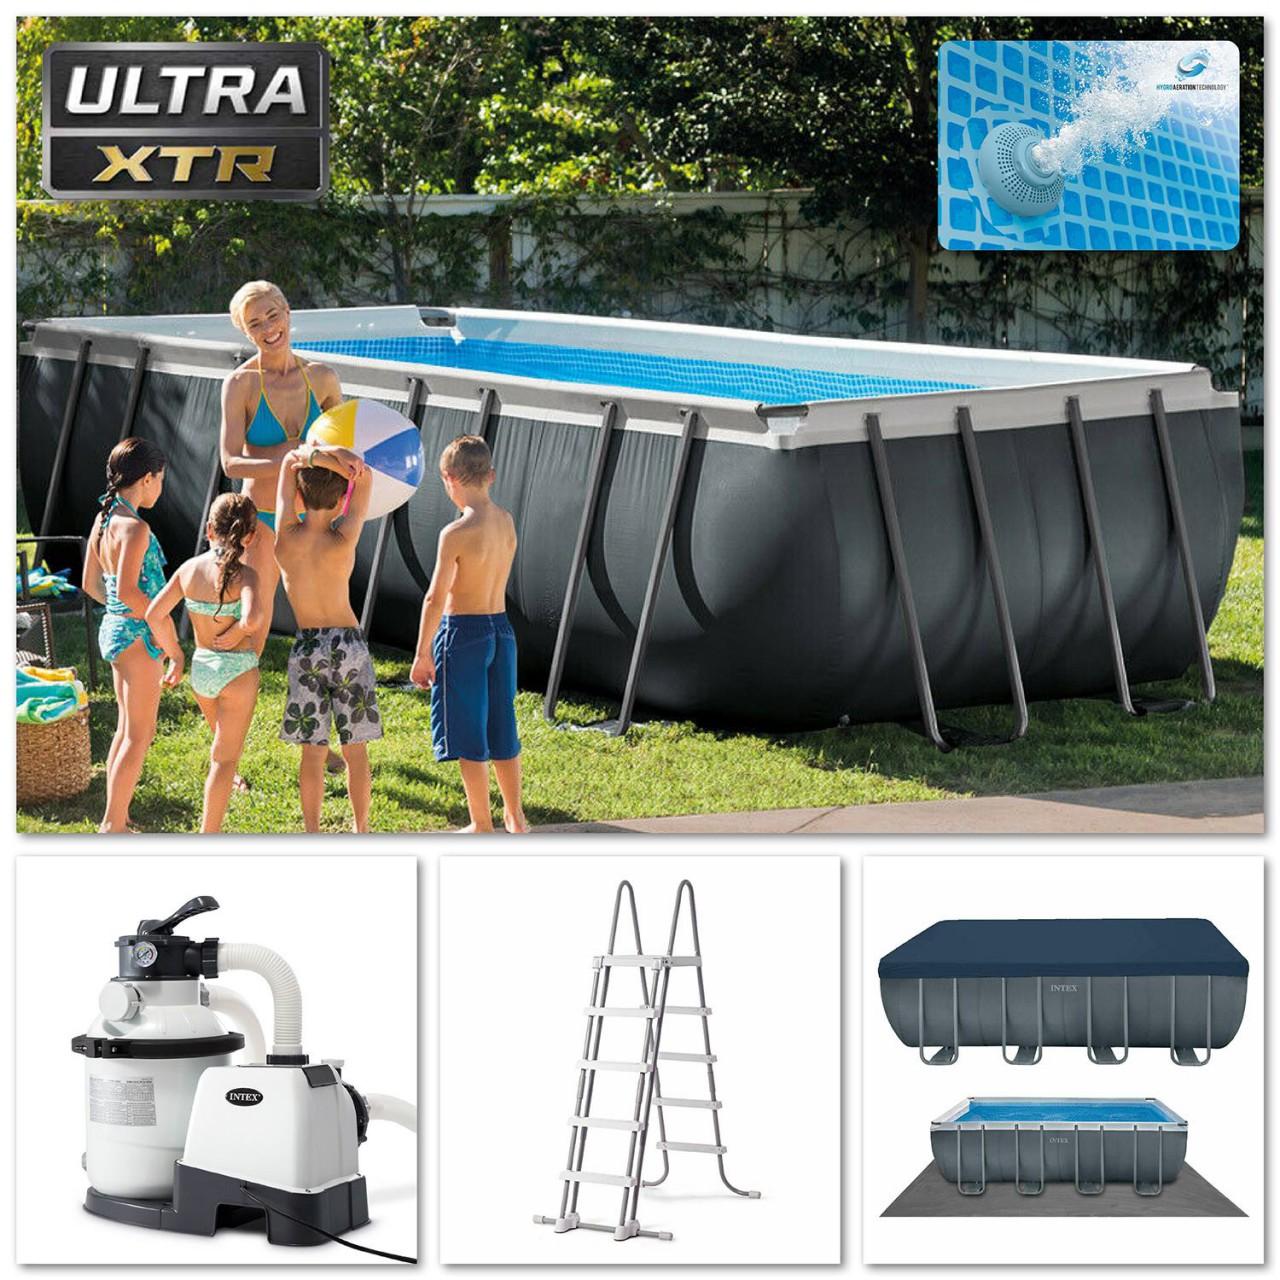 Intex Swimmingpool XTR Ultra Frame Pool Set 549 x 274 x 132 cm 26356